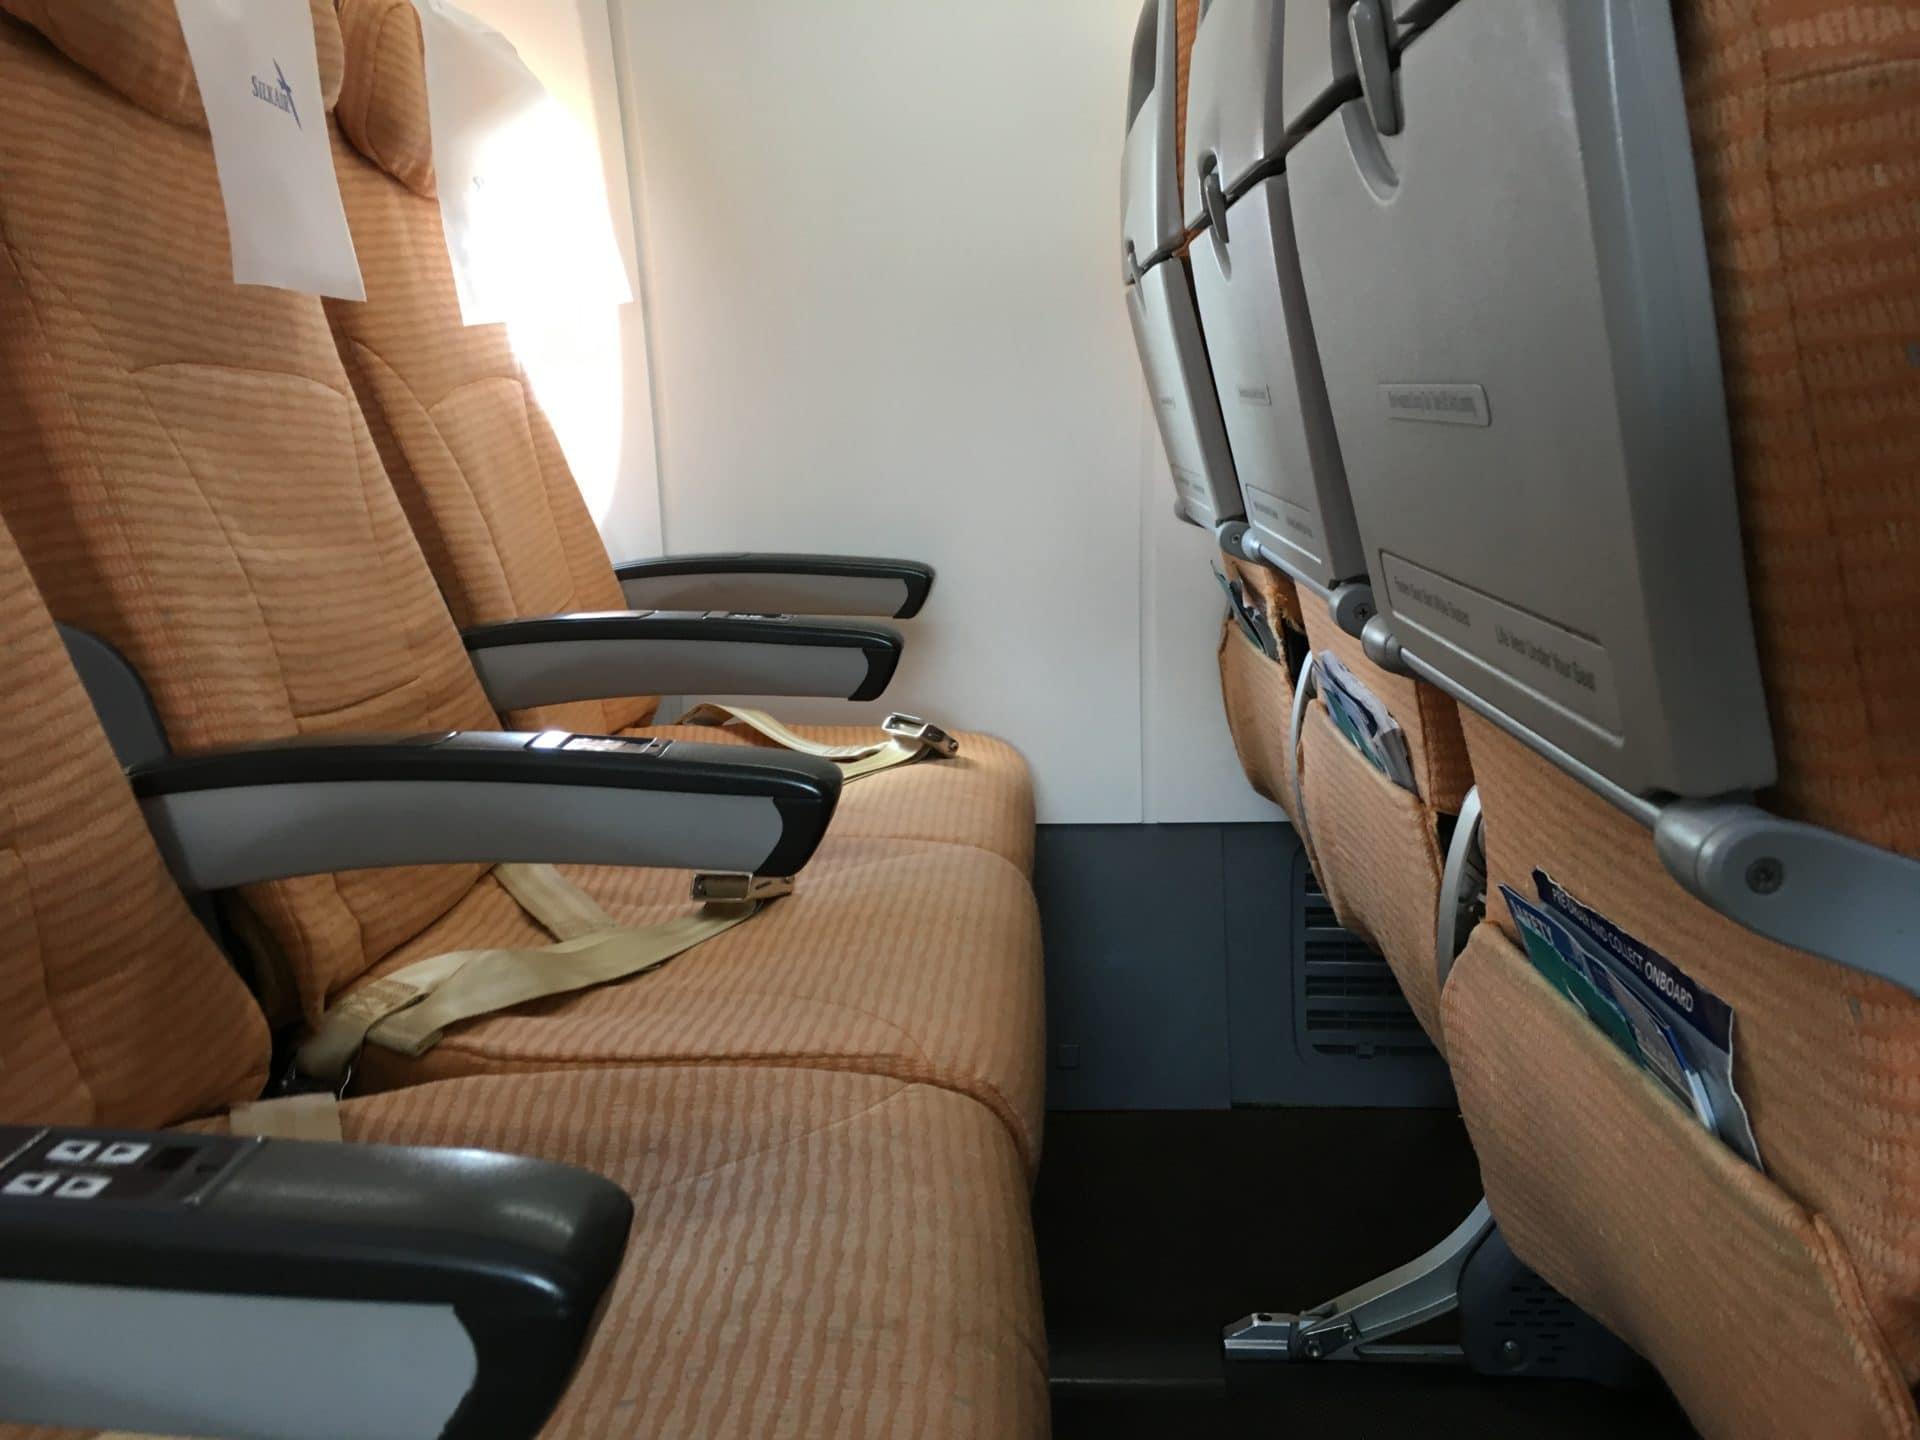 Silk Air Economy Class Kurzstrecke Sitzabstand 4